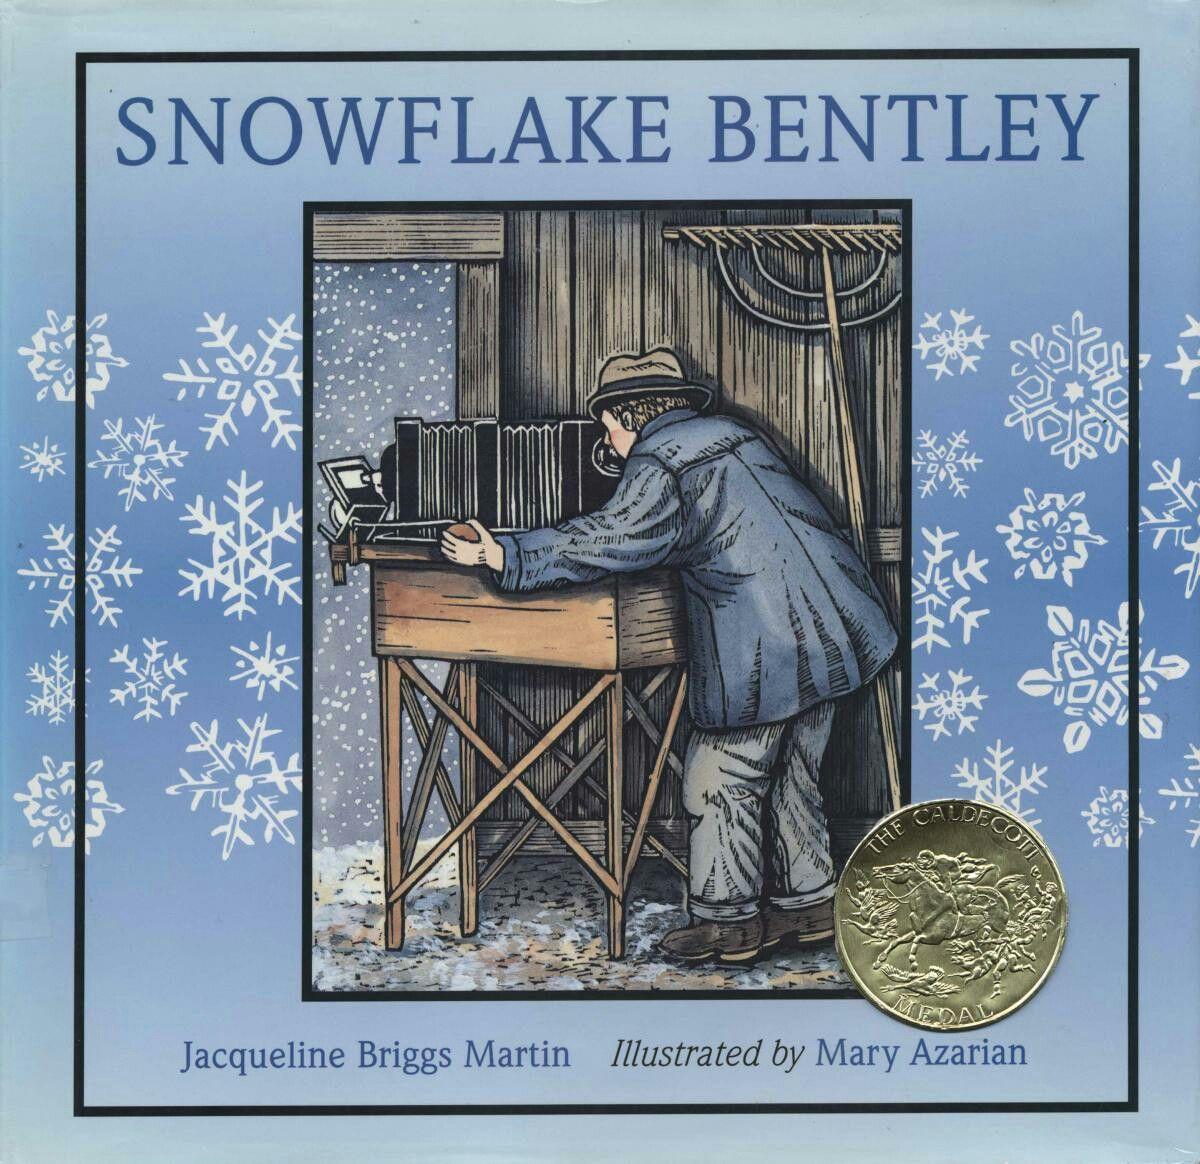 Pin by bridget on childrens books snowflake bentley